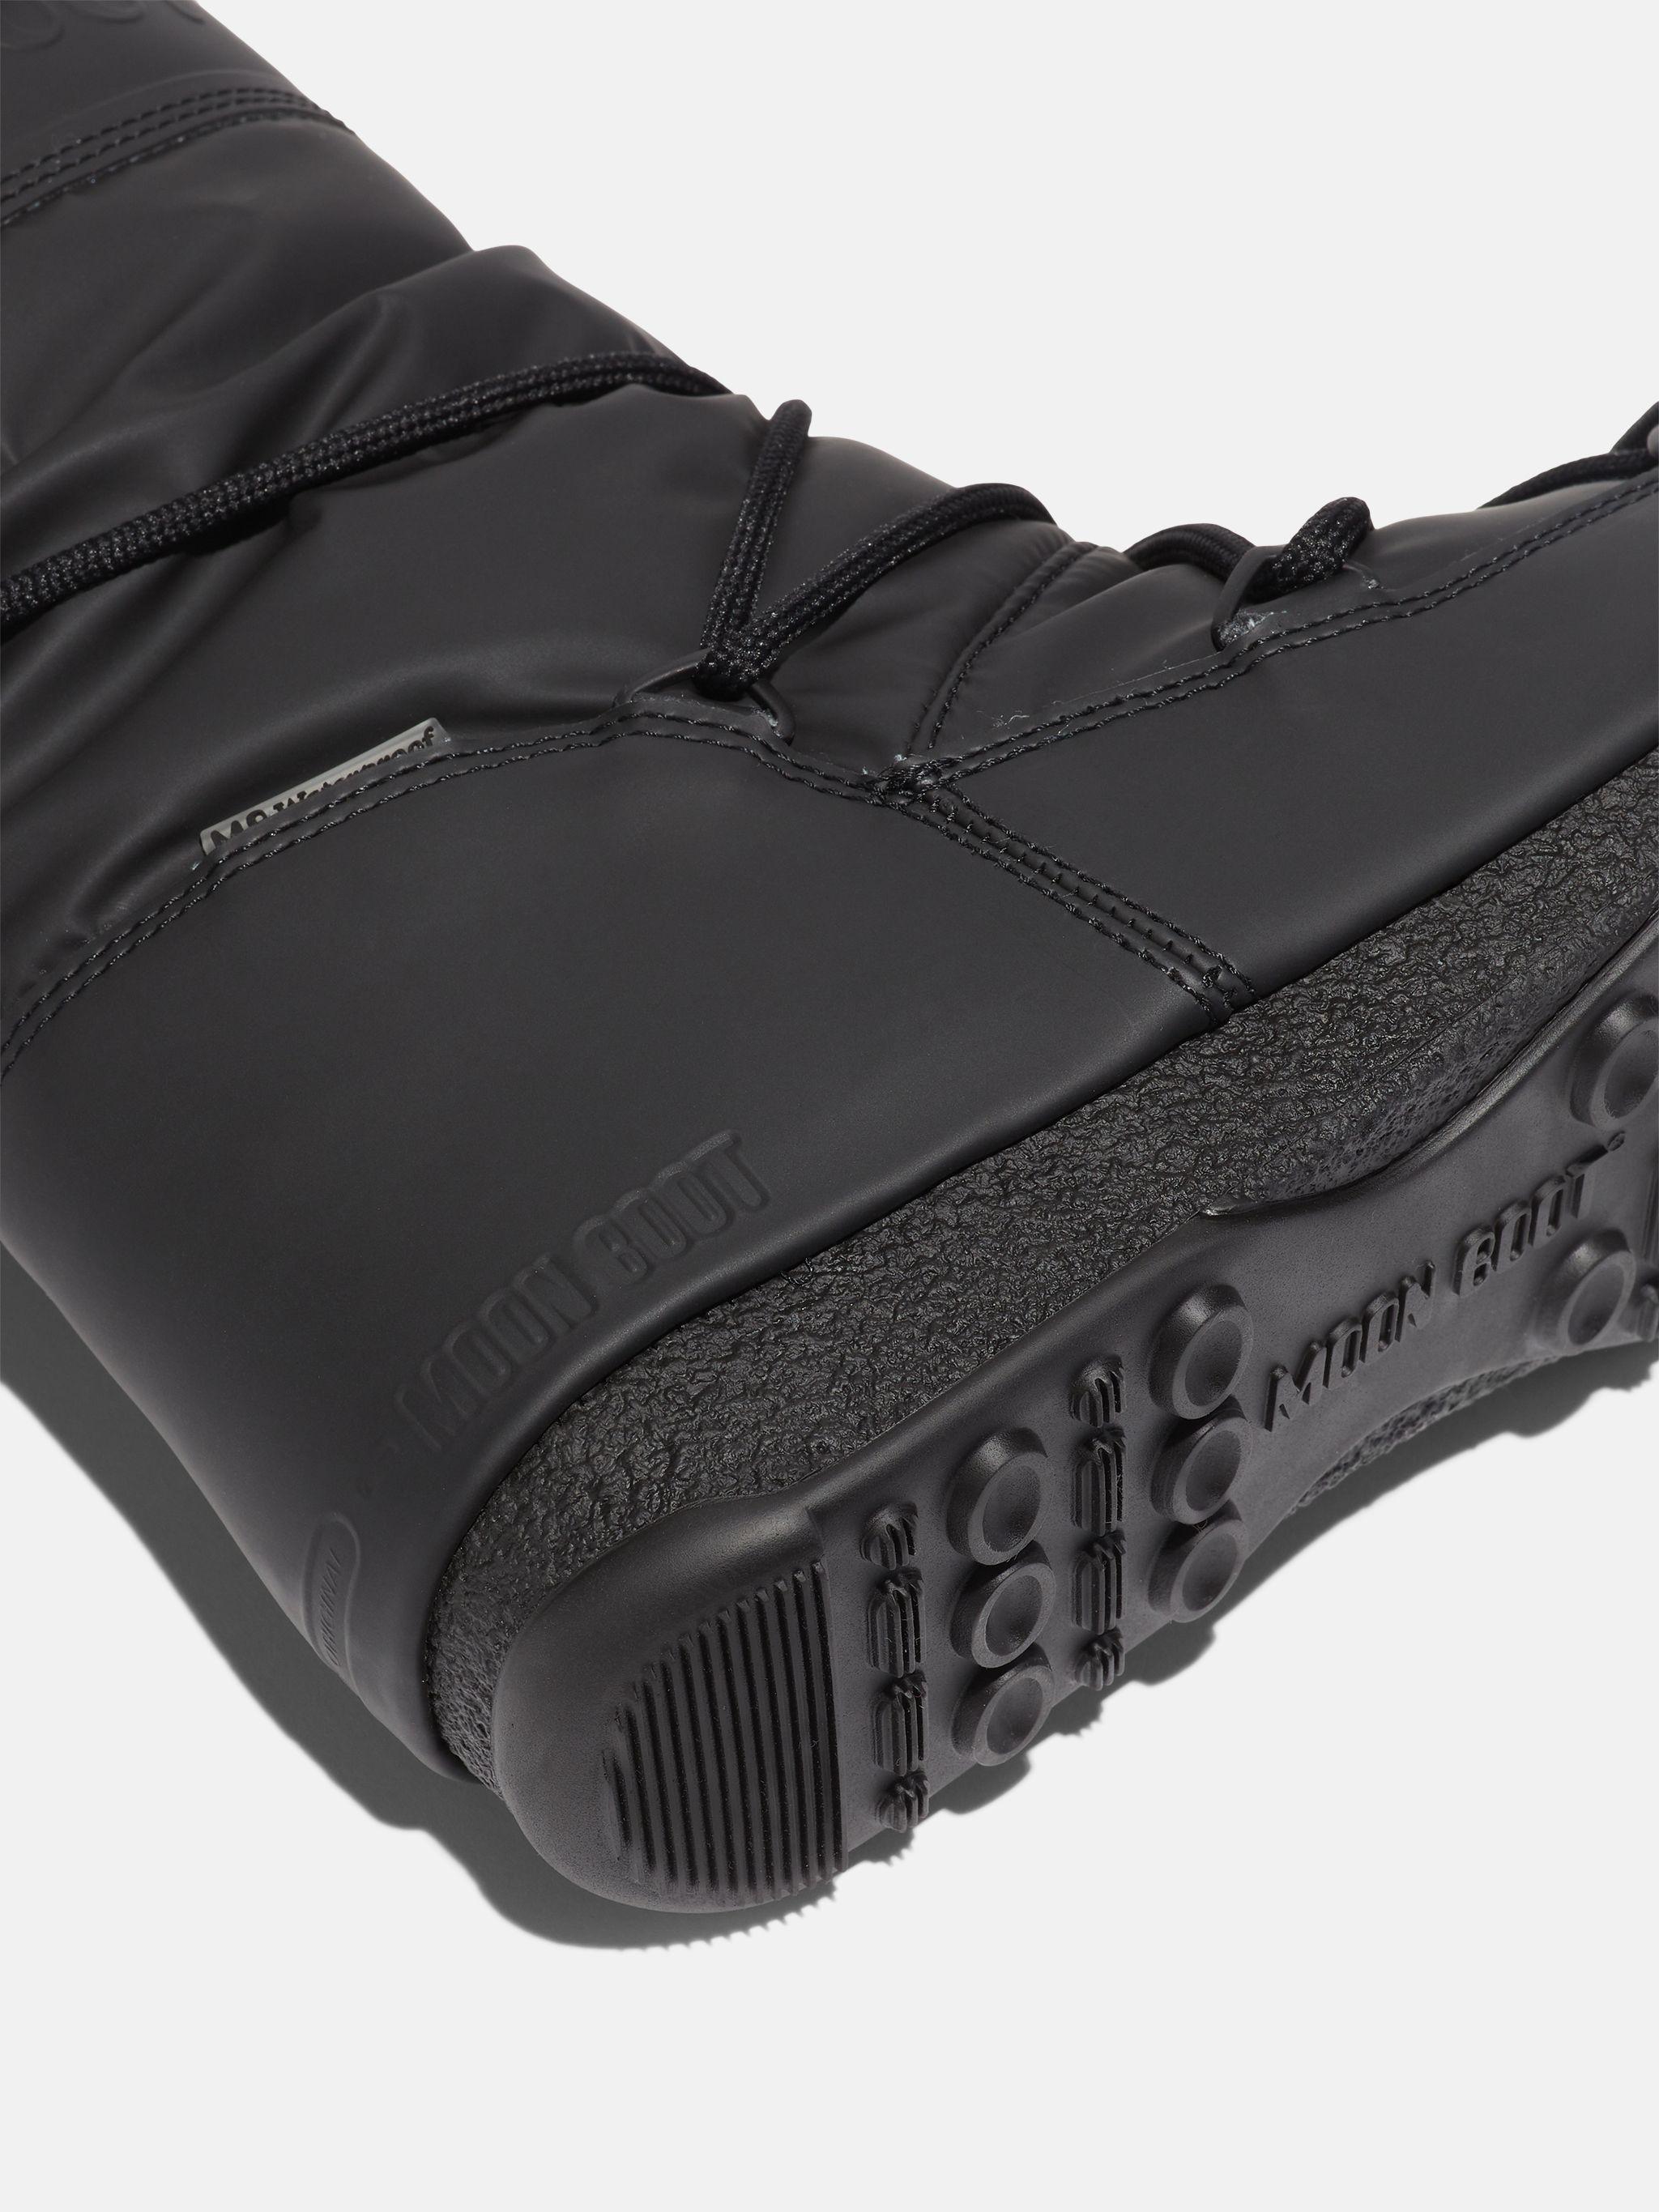 BOTAS PROTECHT HI-TOP BLACK DE GOMA